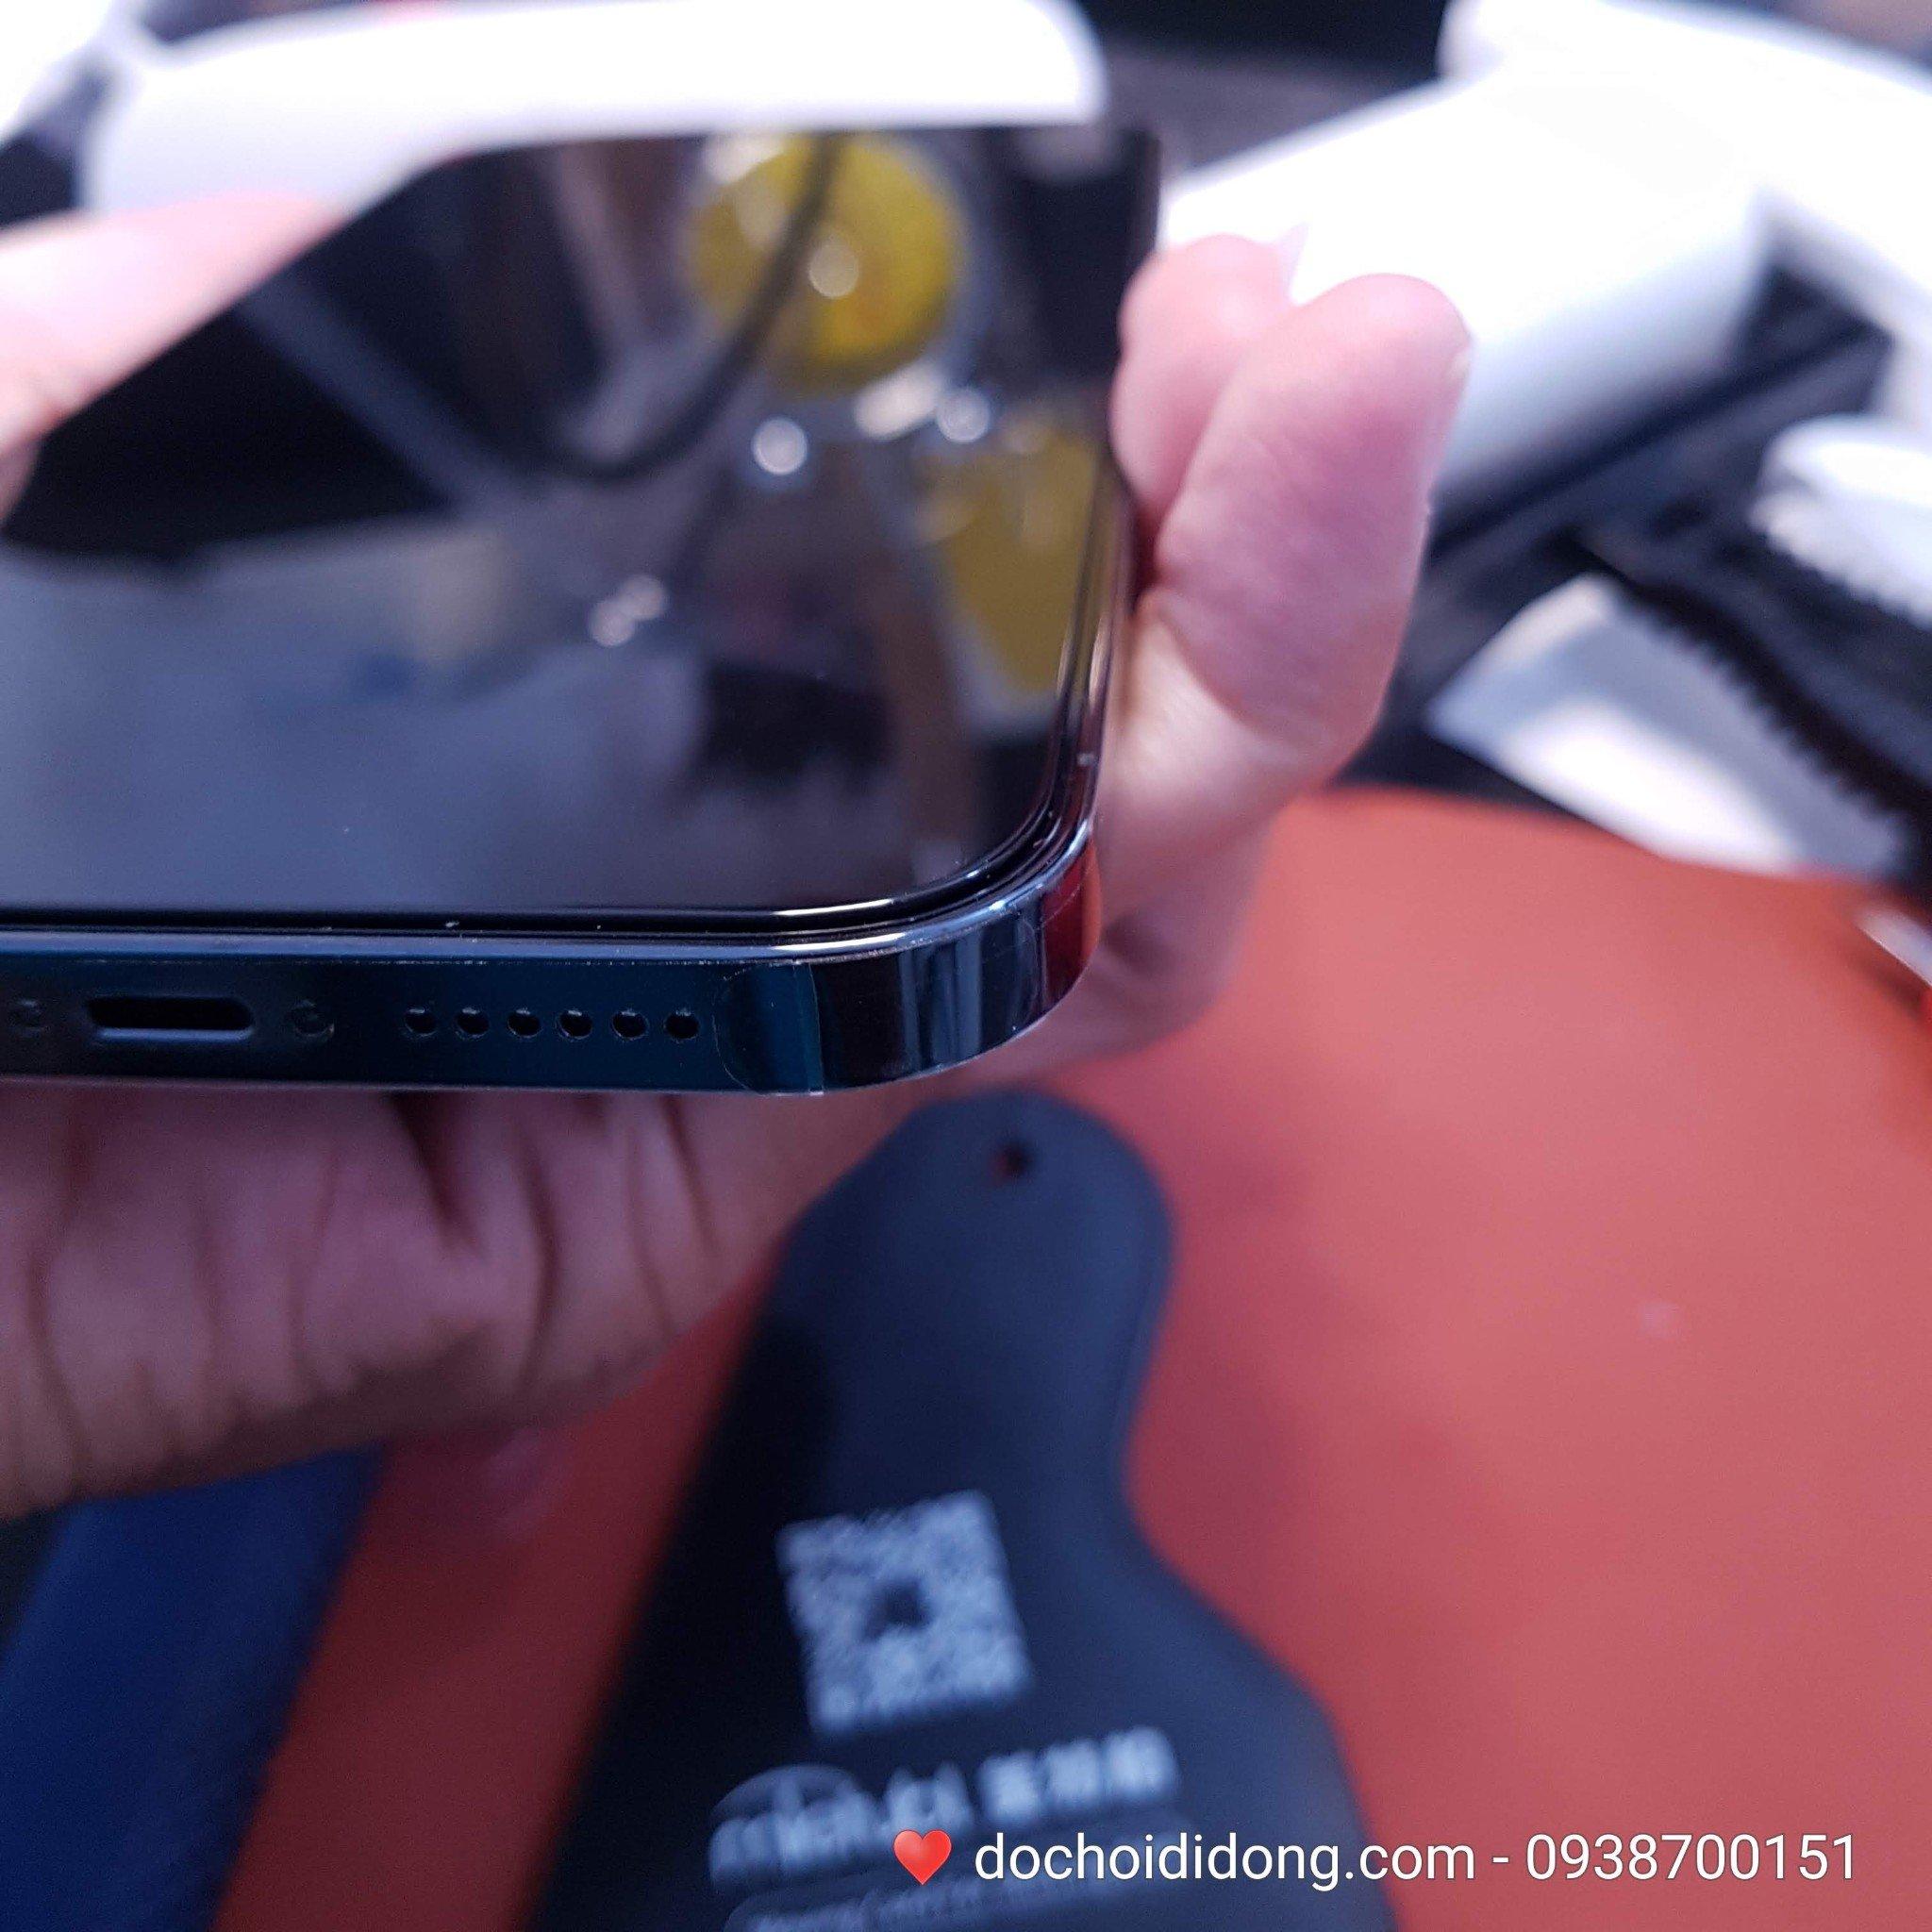 mieng-dan-cuong-luc-iphone-12-pro-max-mini-zacase-all-clear-true-2-5d